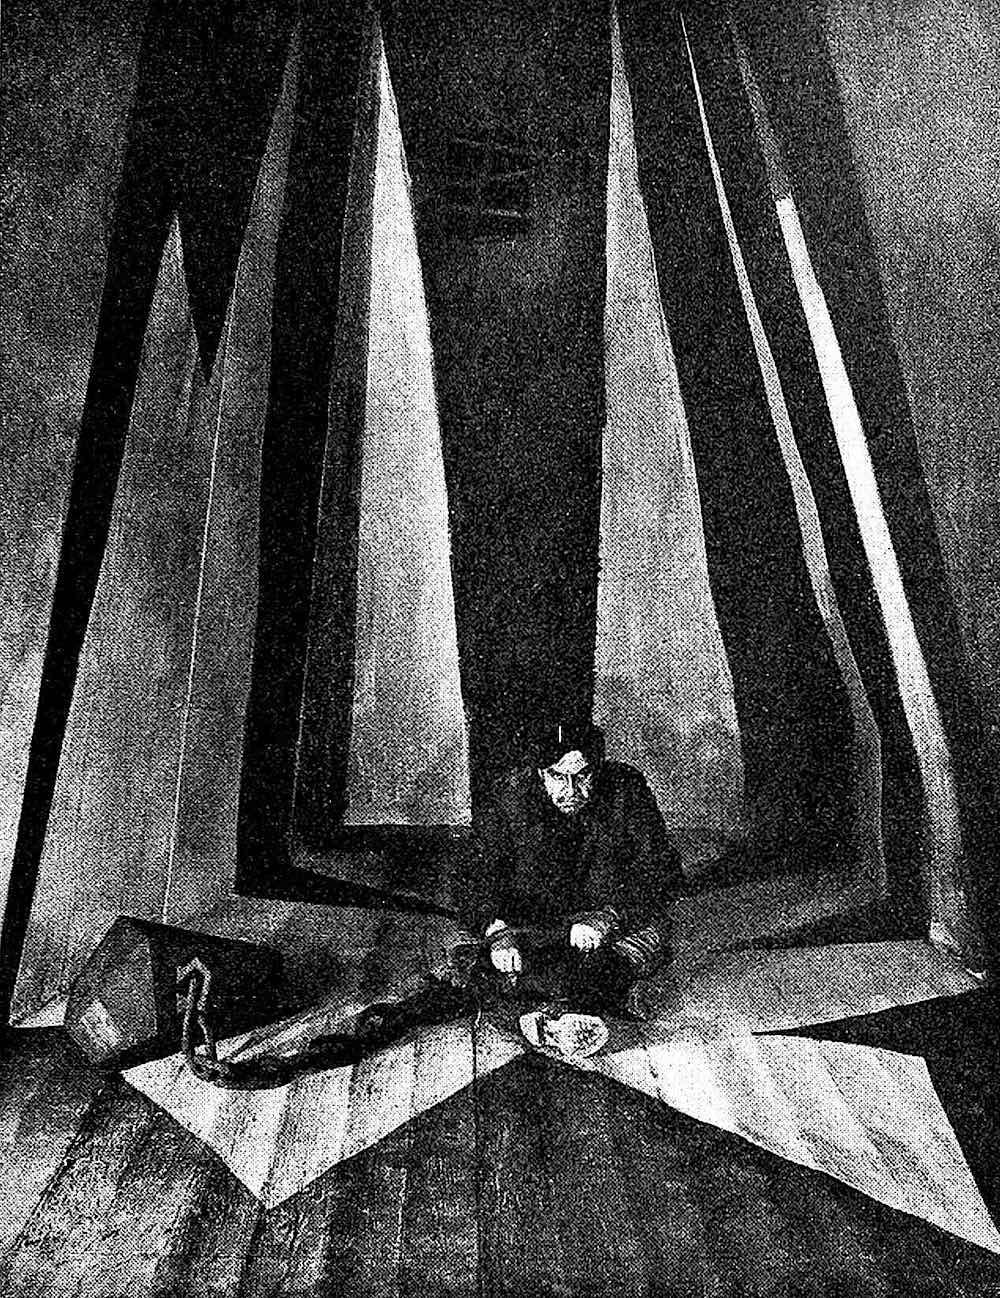 a 1922 theatre stage design of a man in prison